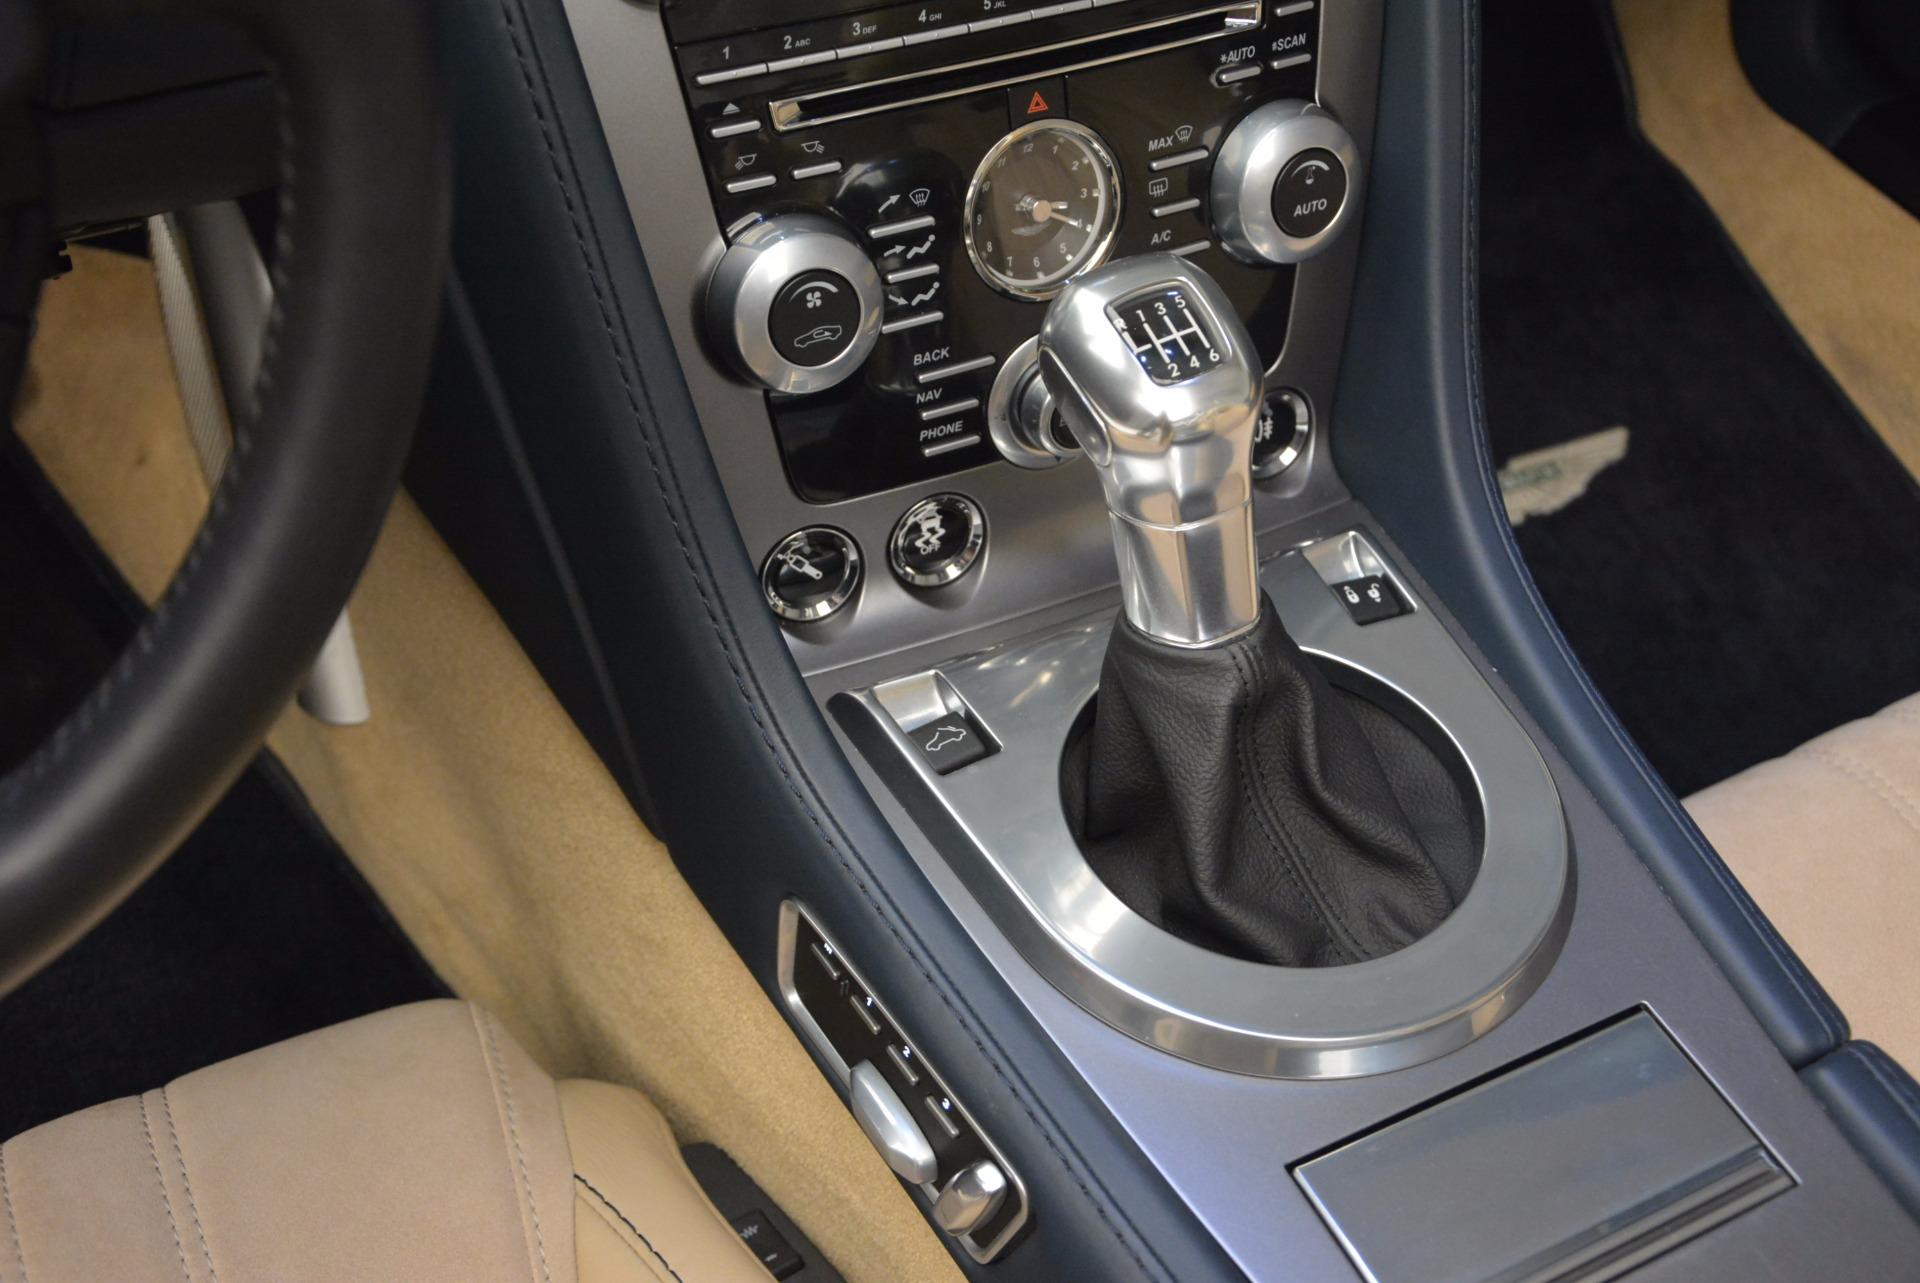 Used 2012 Aston Martin DBS Volante For Sale In Greenwich, CT 644_p31